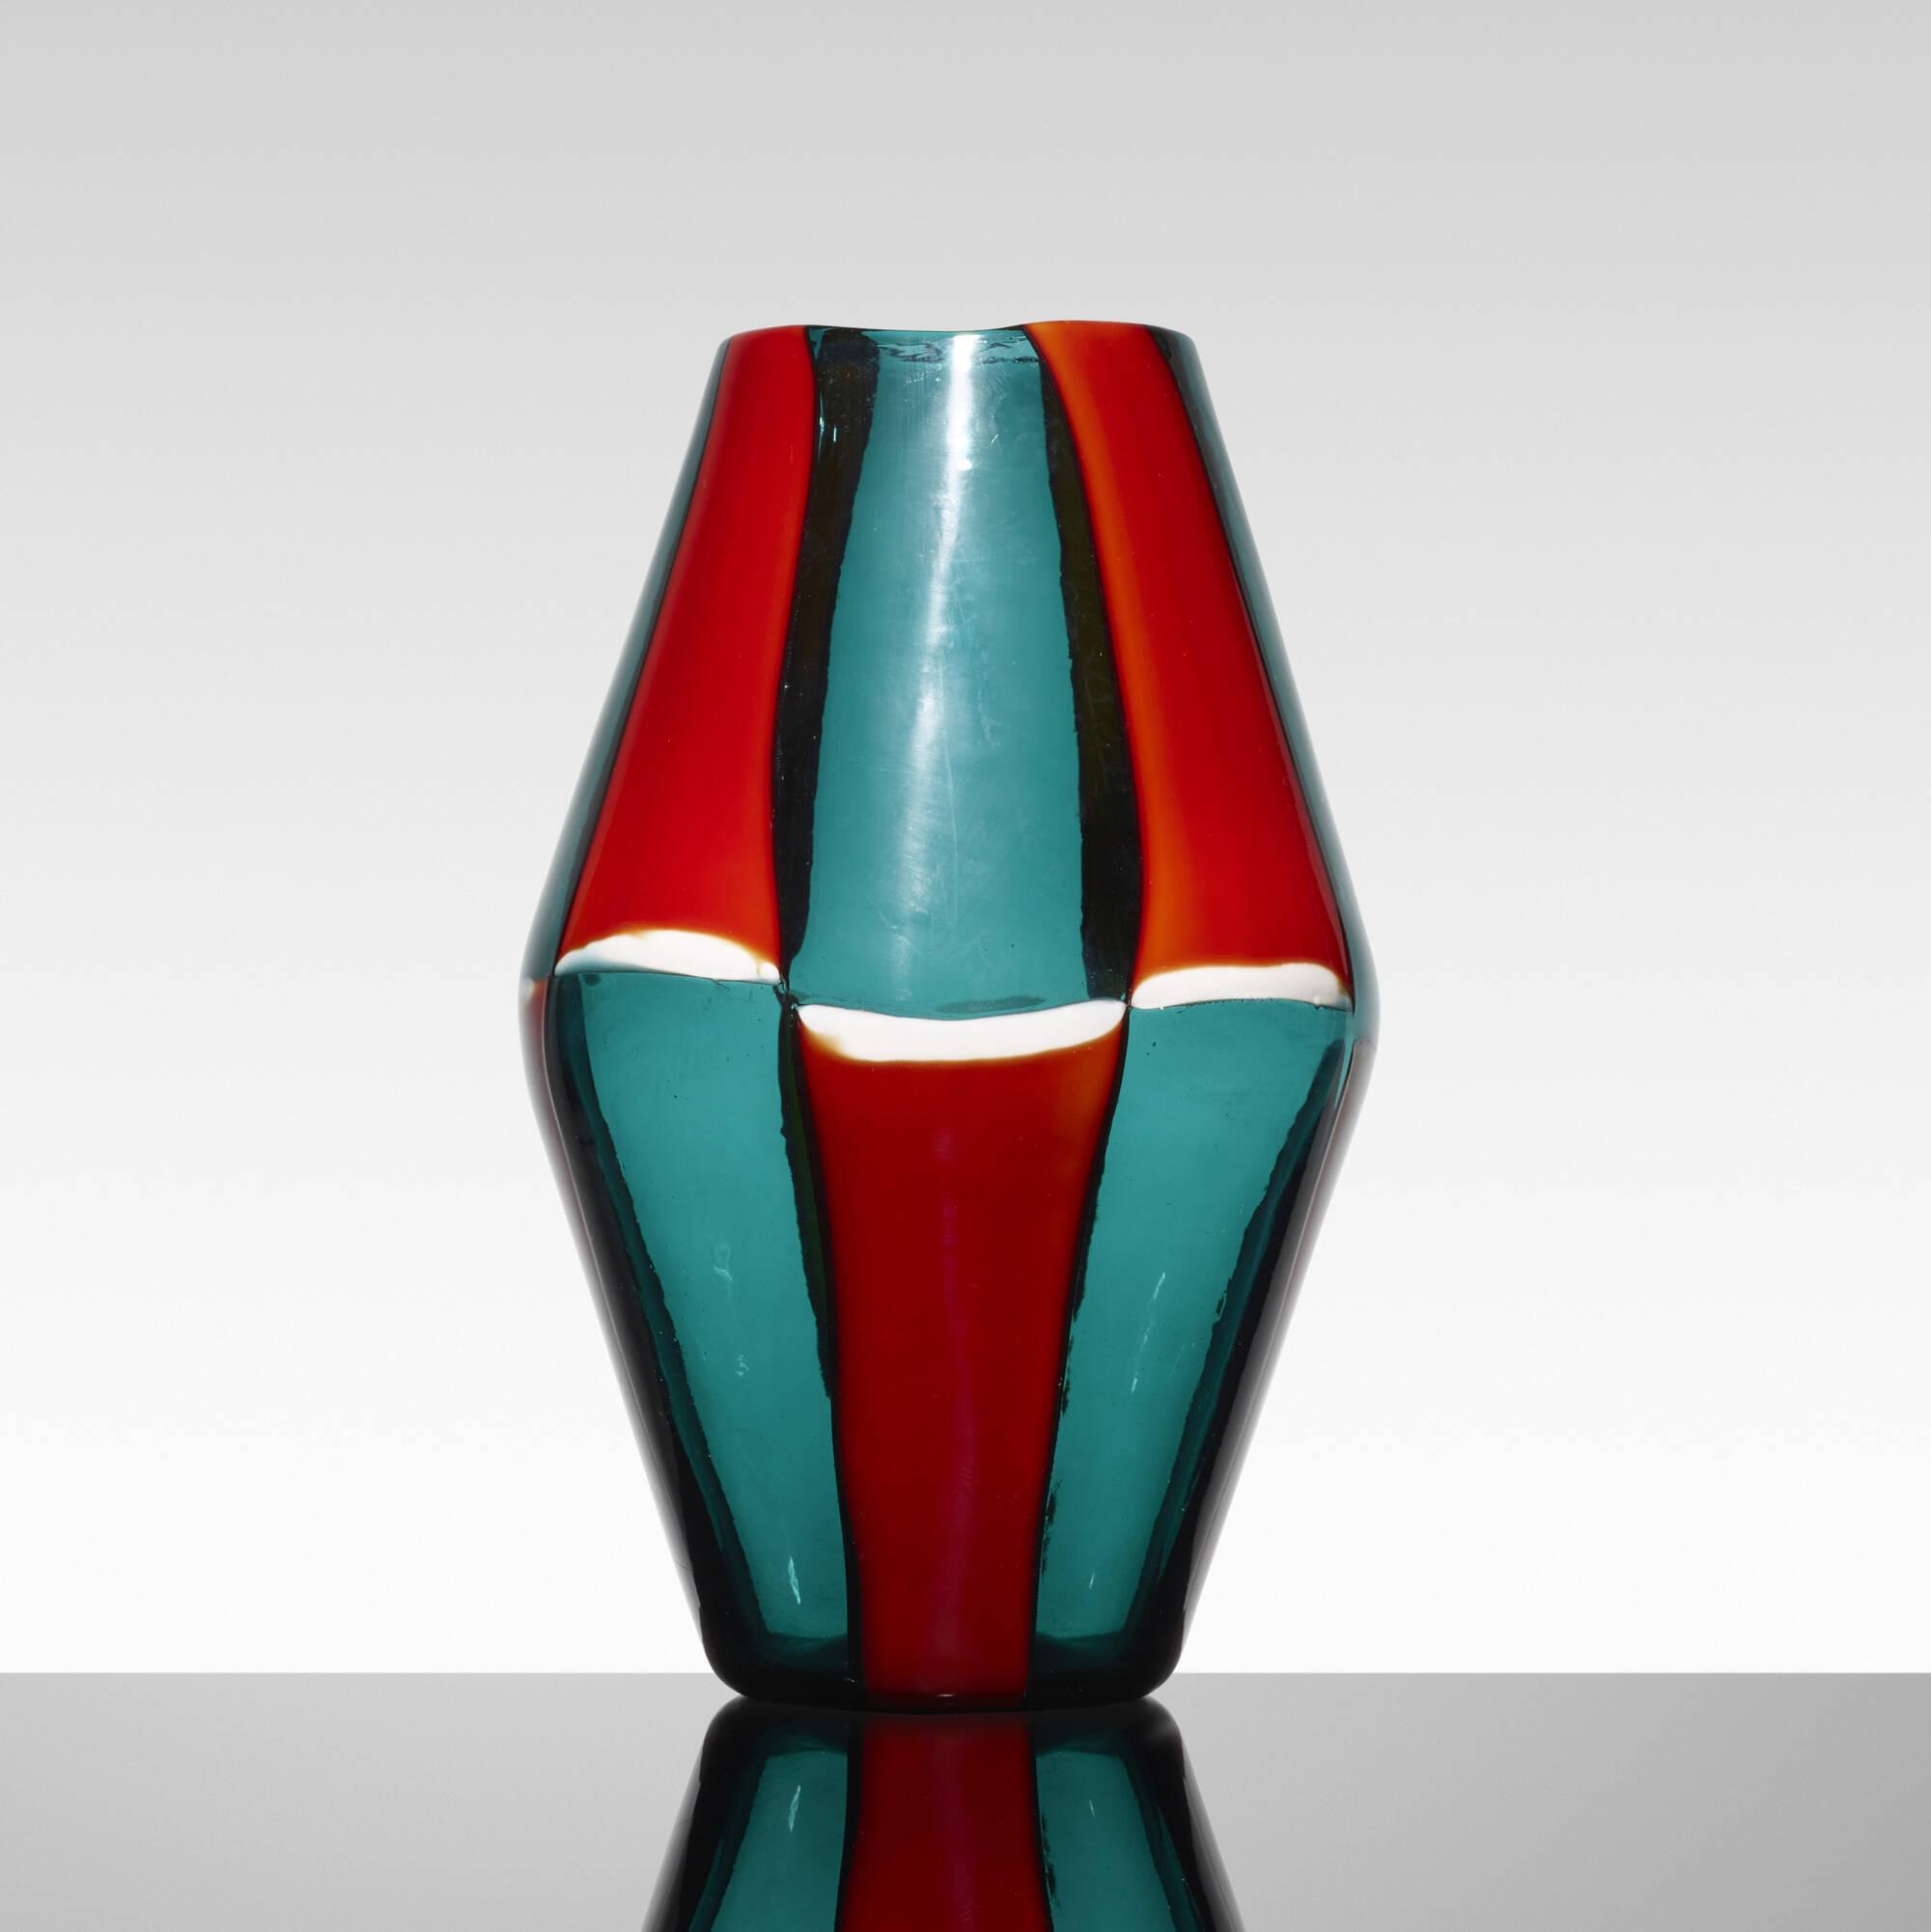 144: Fulvio Bianconi / Bi-Pezzato vase, model 4318 (2 of 5)